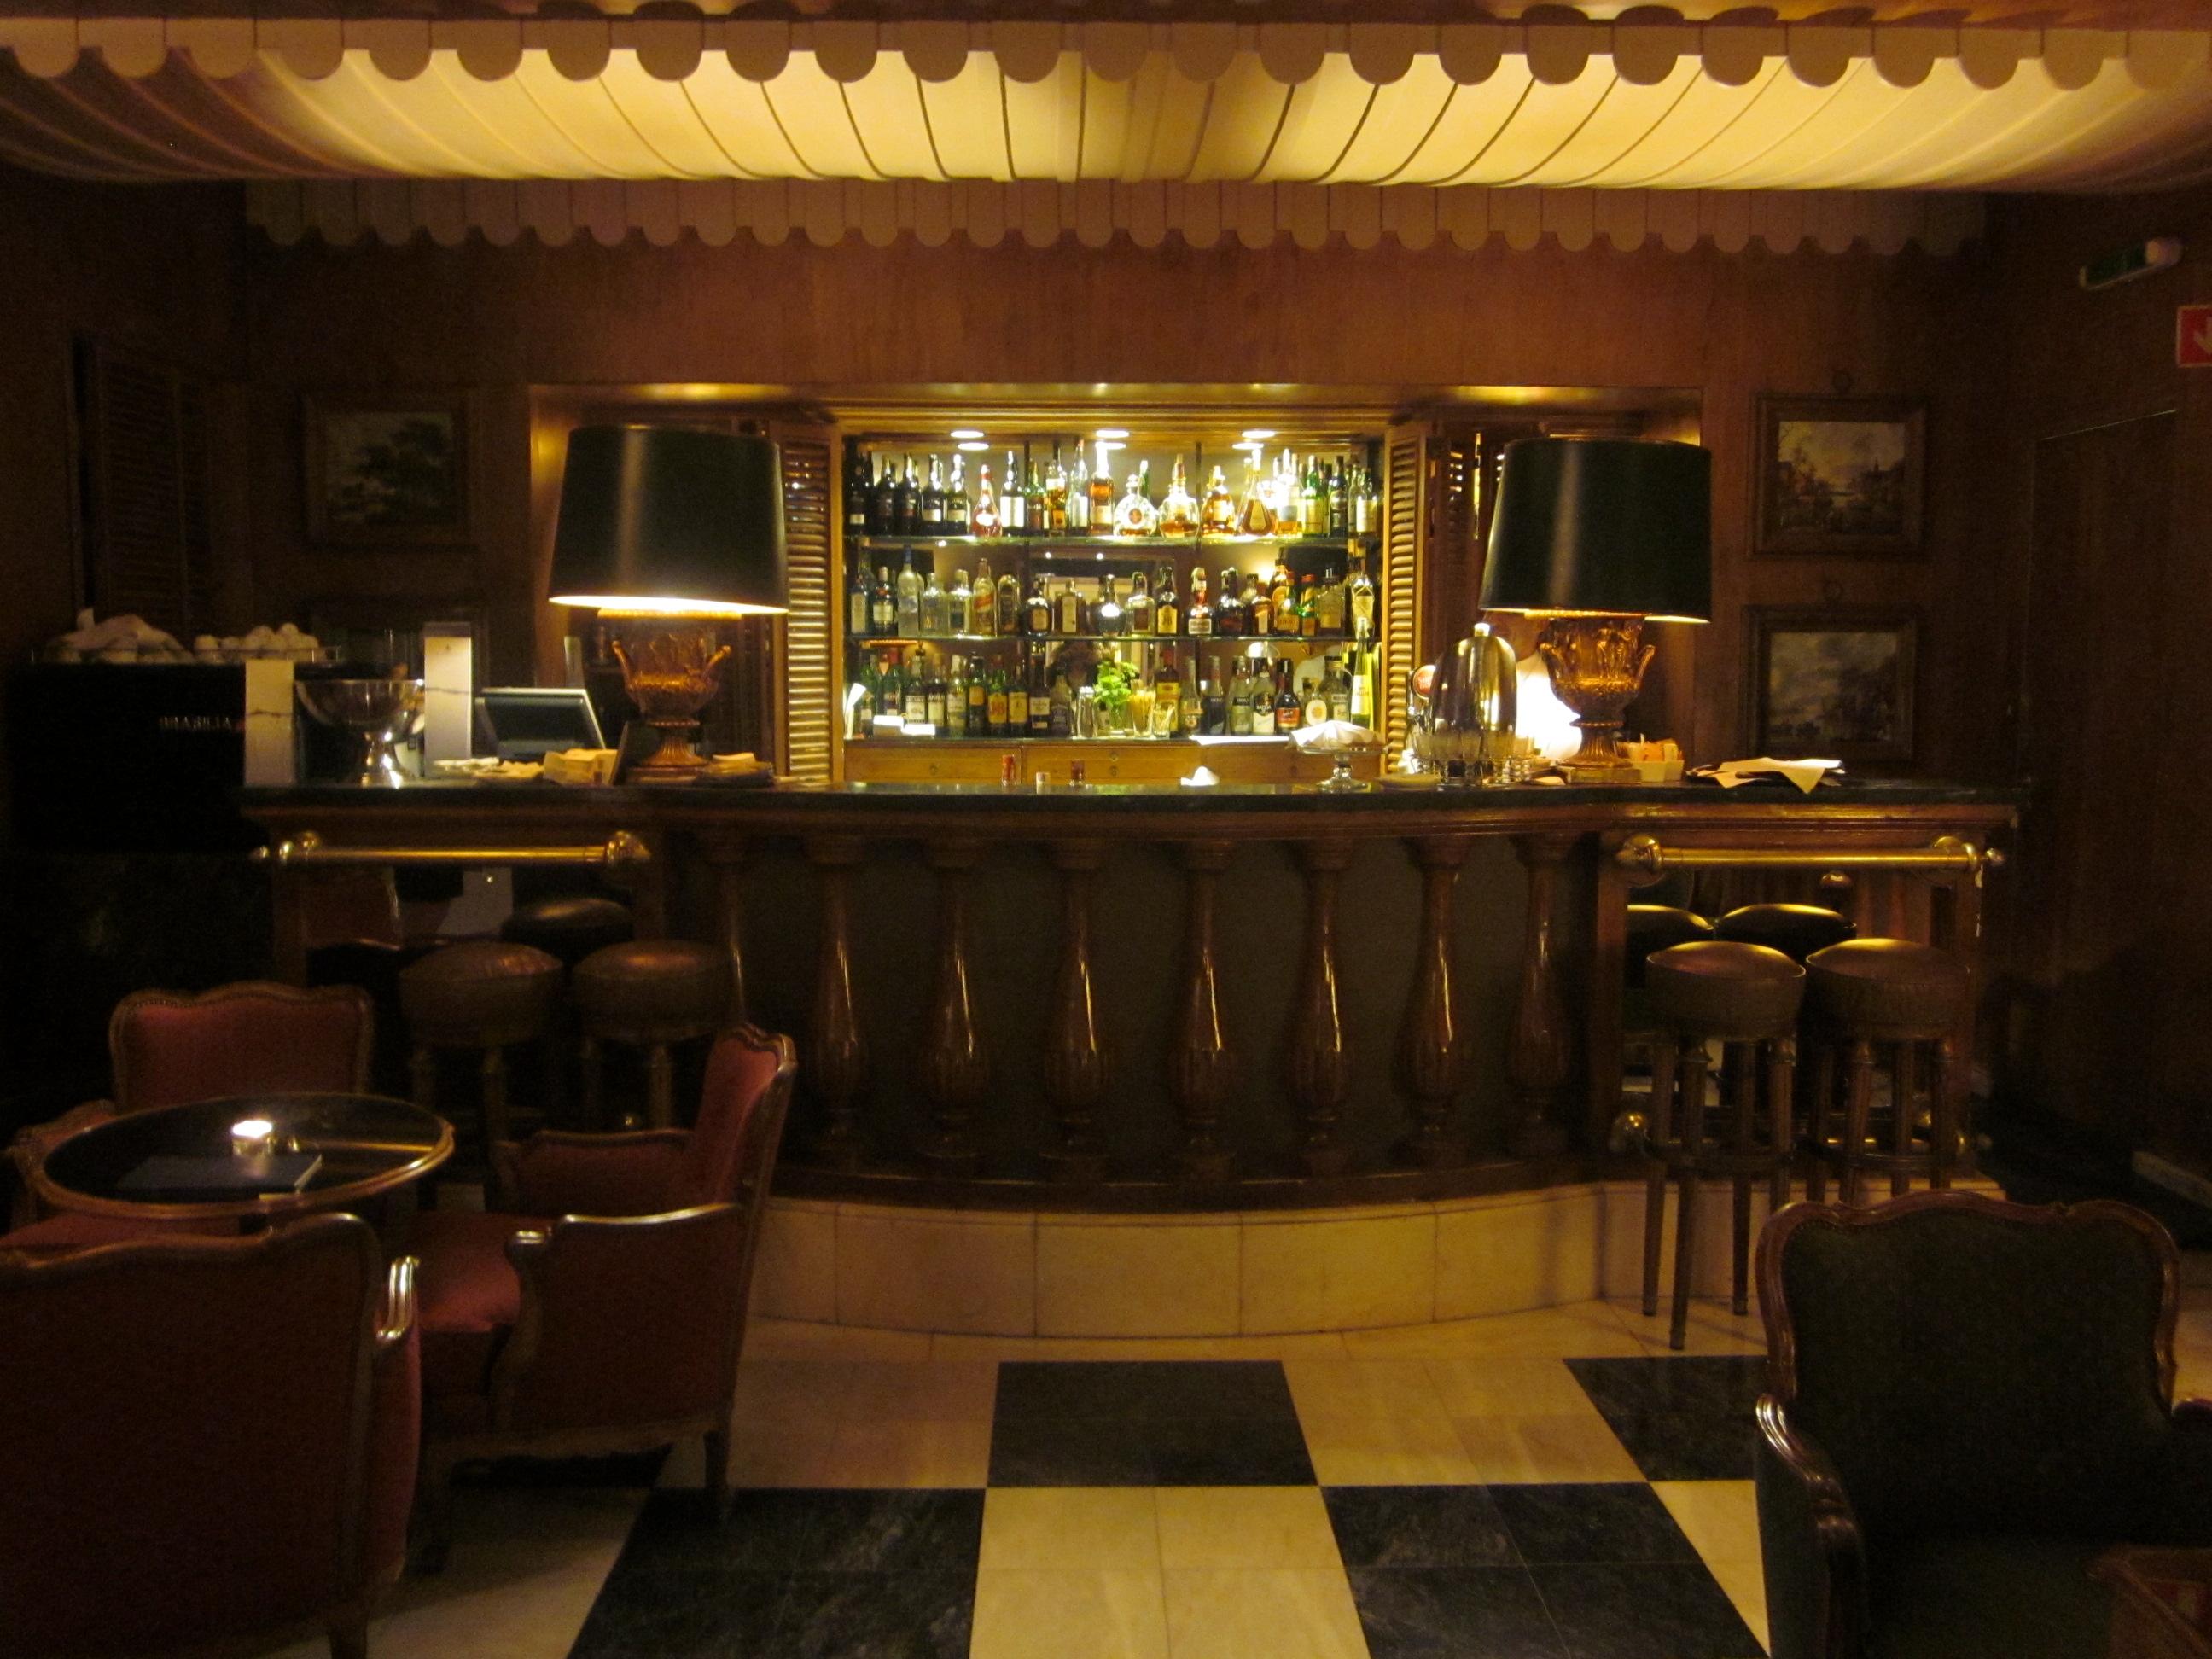 2012-11-16-Bar_HotelPalcio.JPG